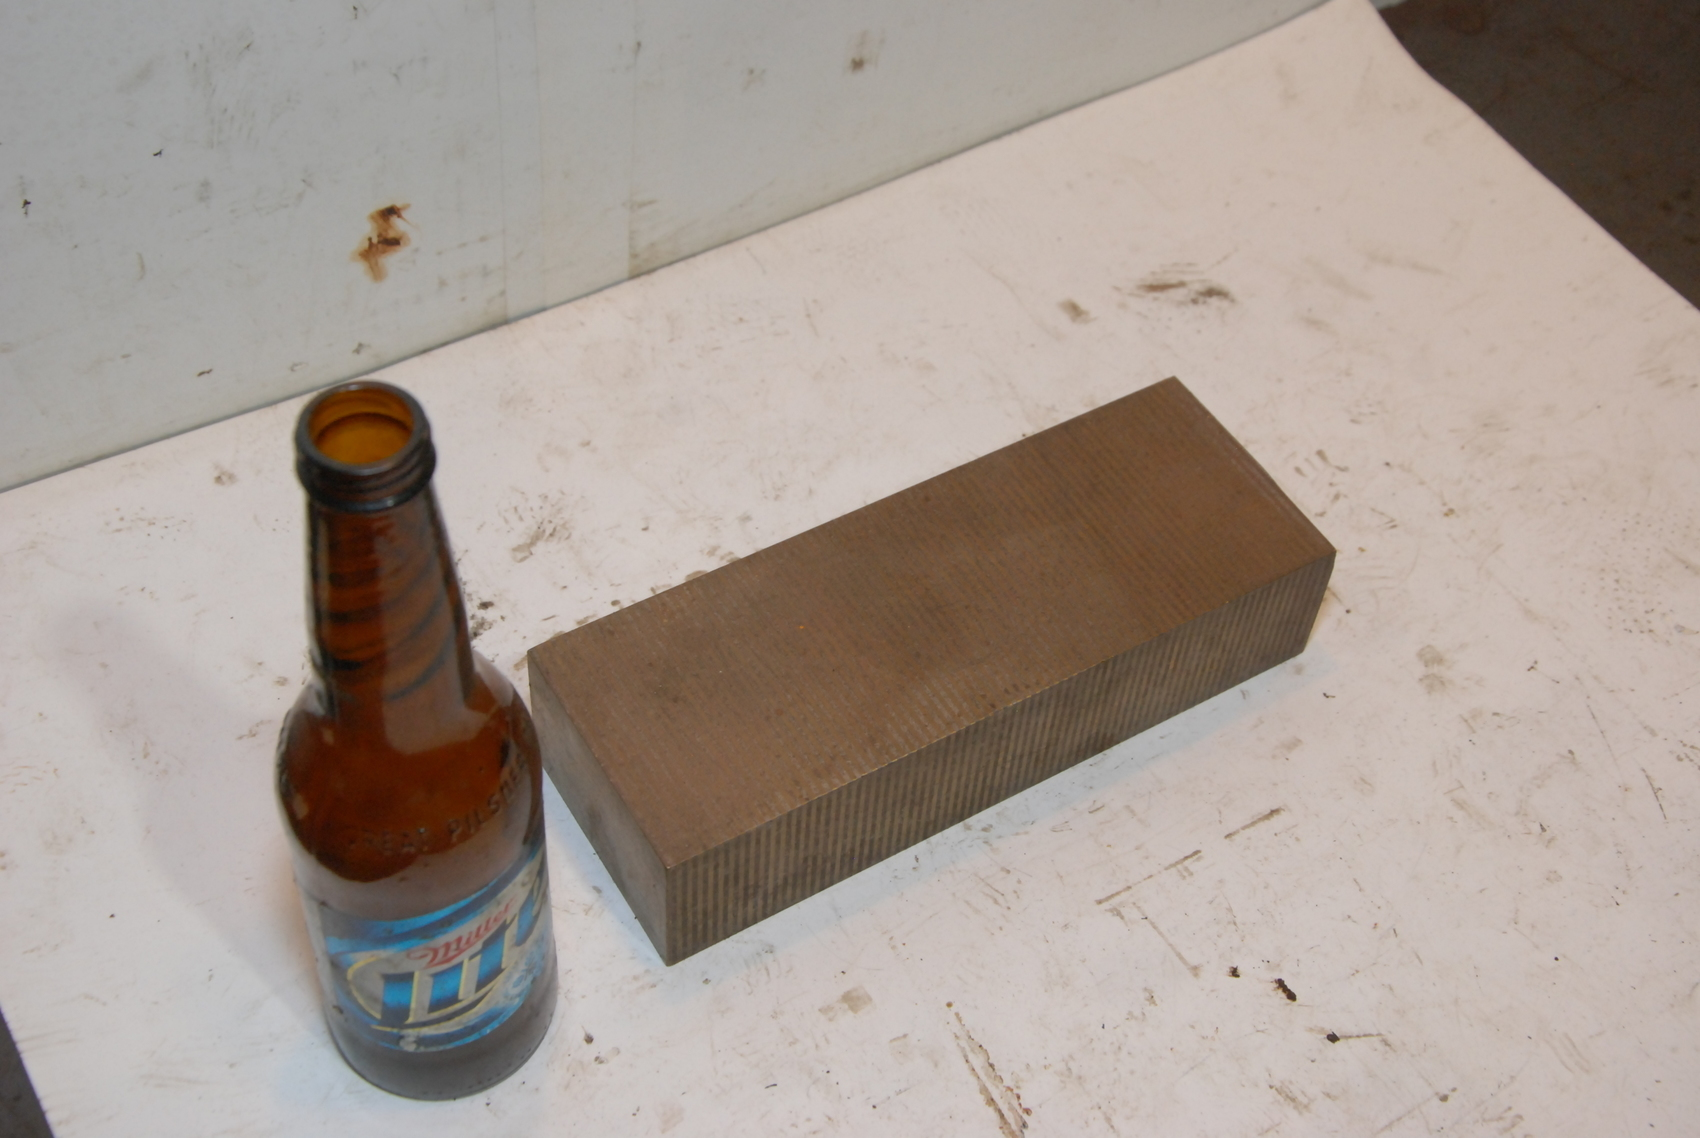 Steel Rectangular Bar for blacksmith anvil,9*3 1/4*2,17lbs